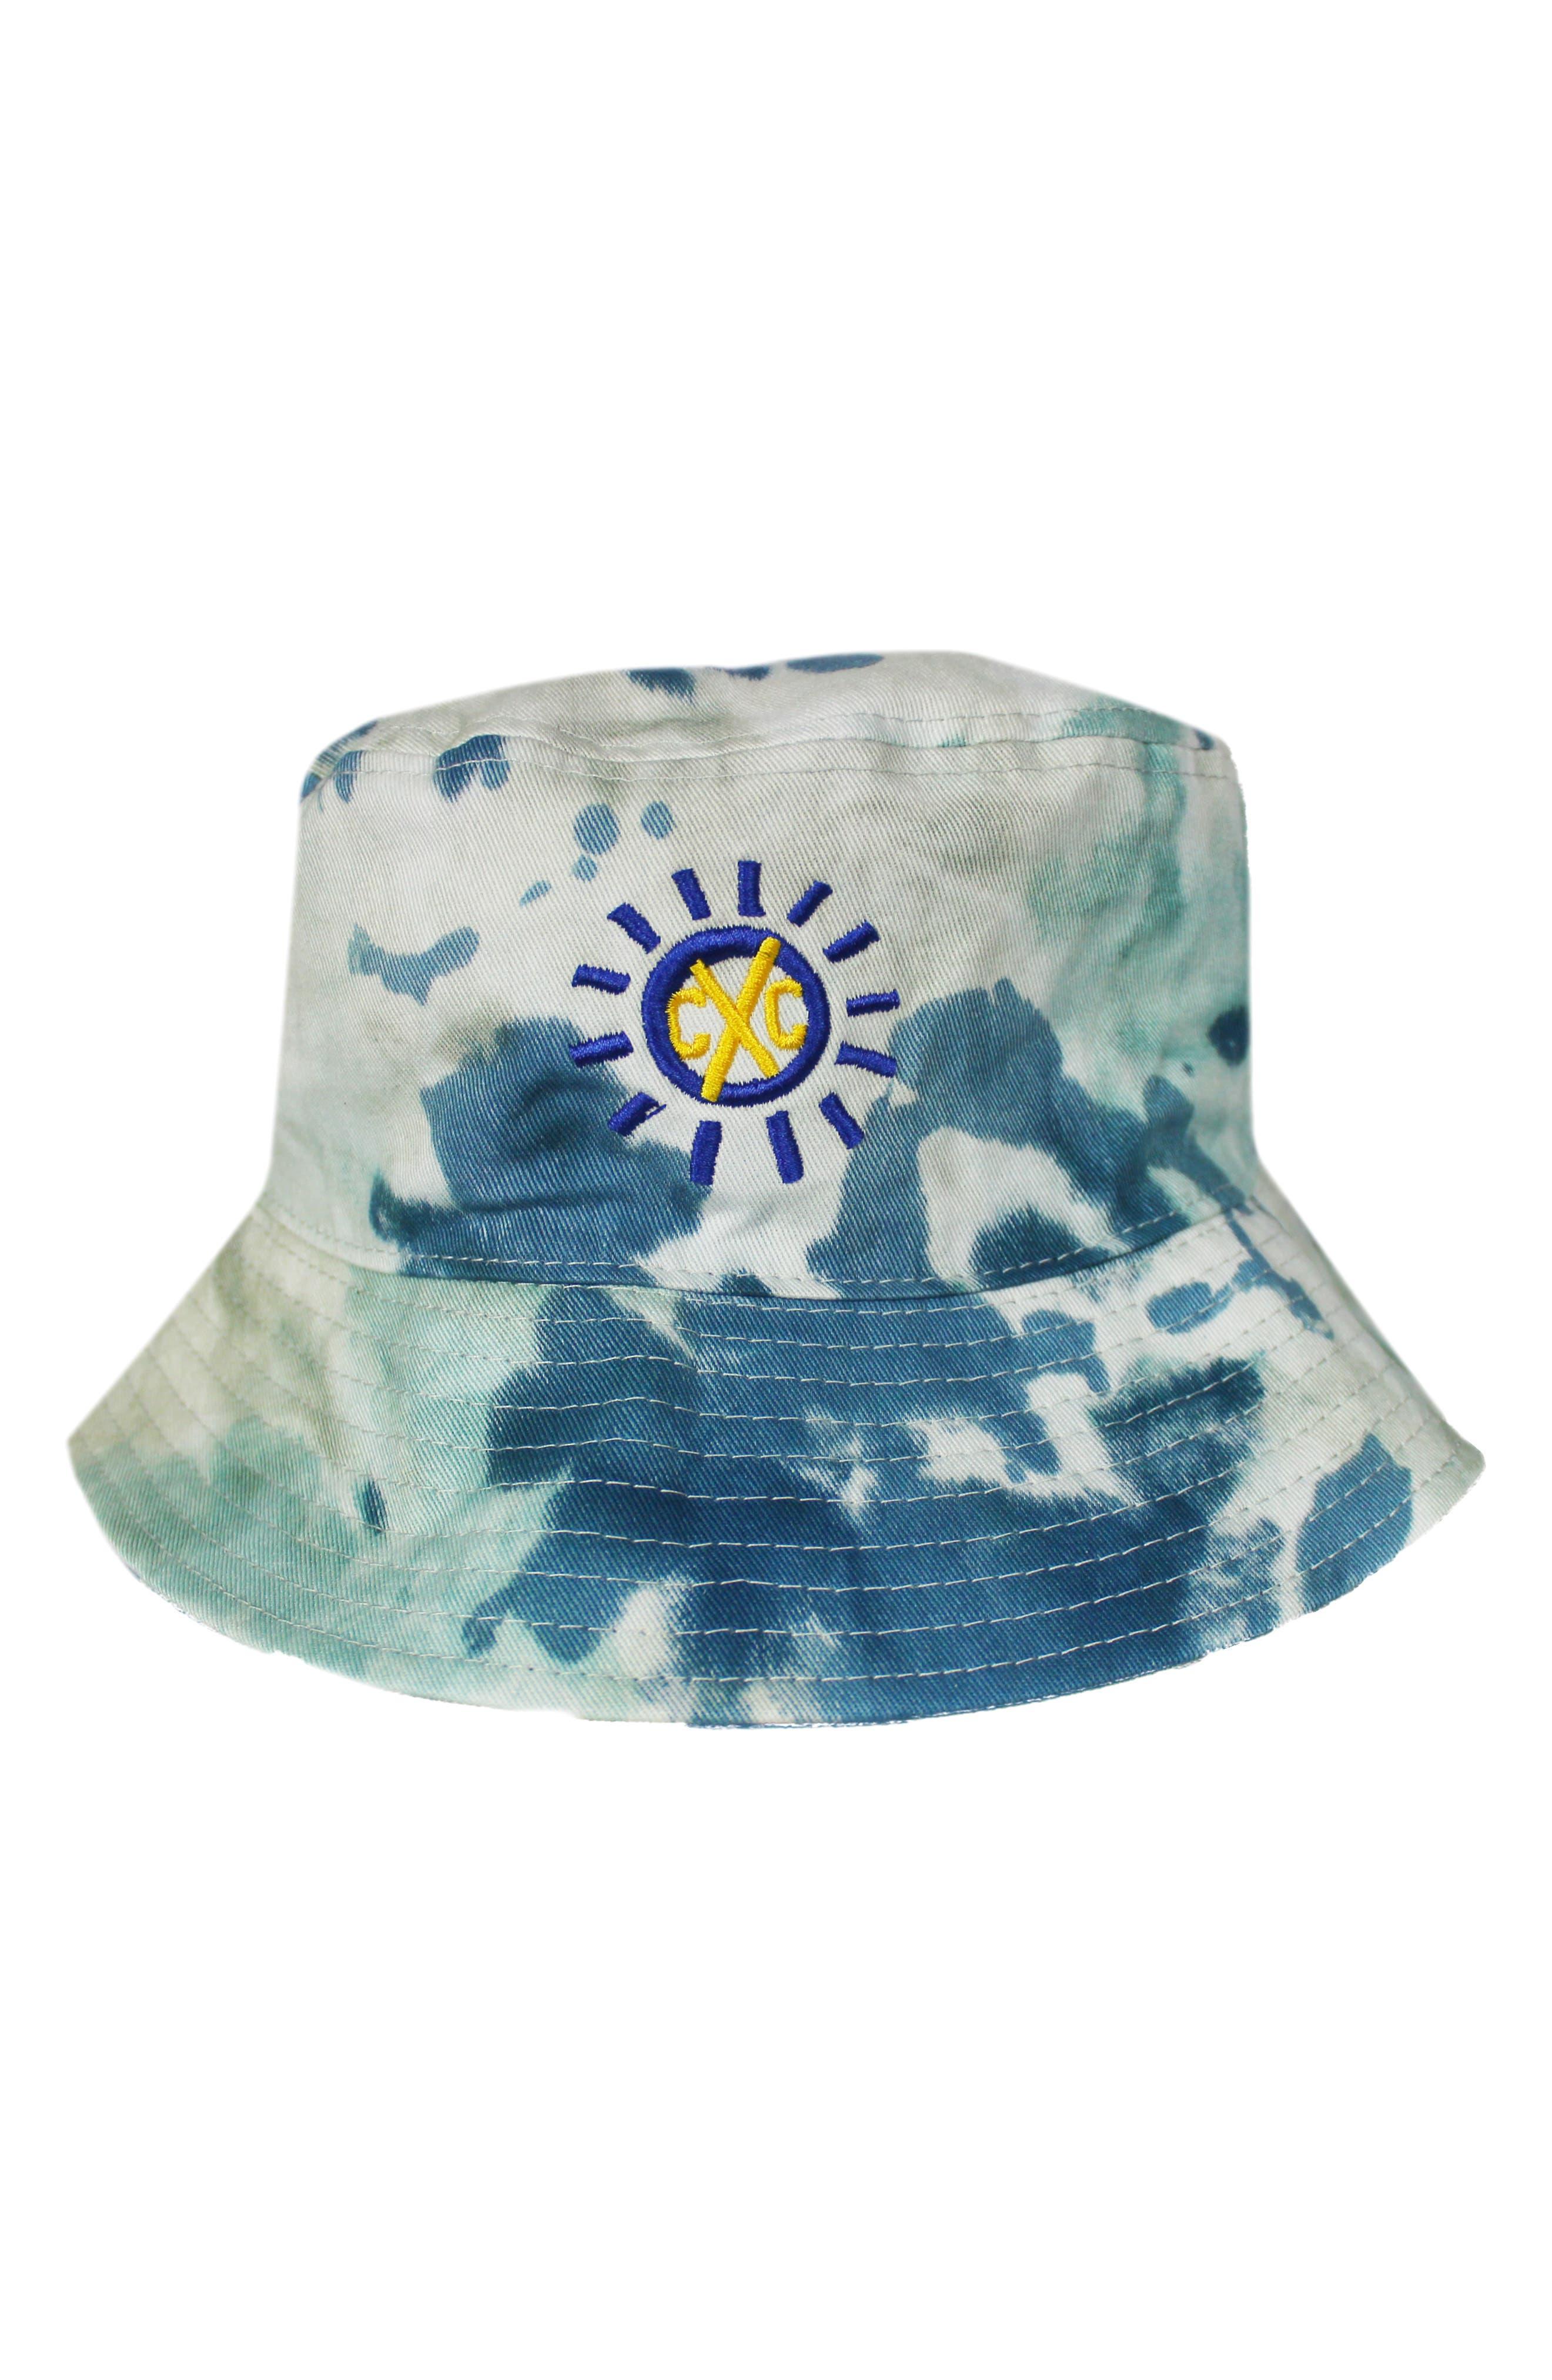 Good Vibrations Tie Dye Bucket Hat